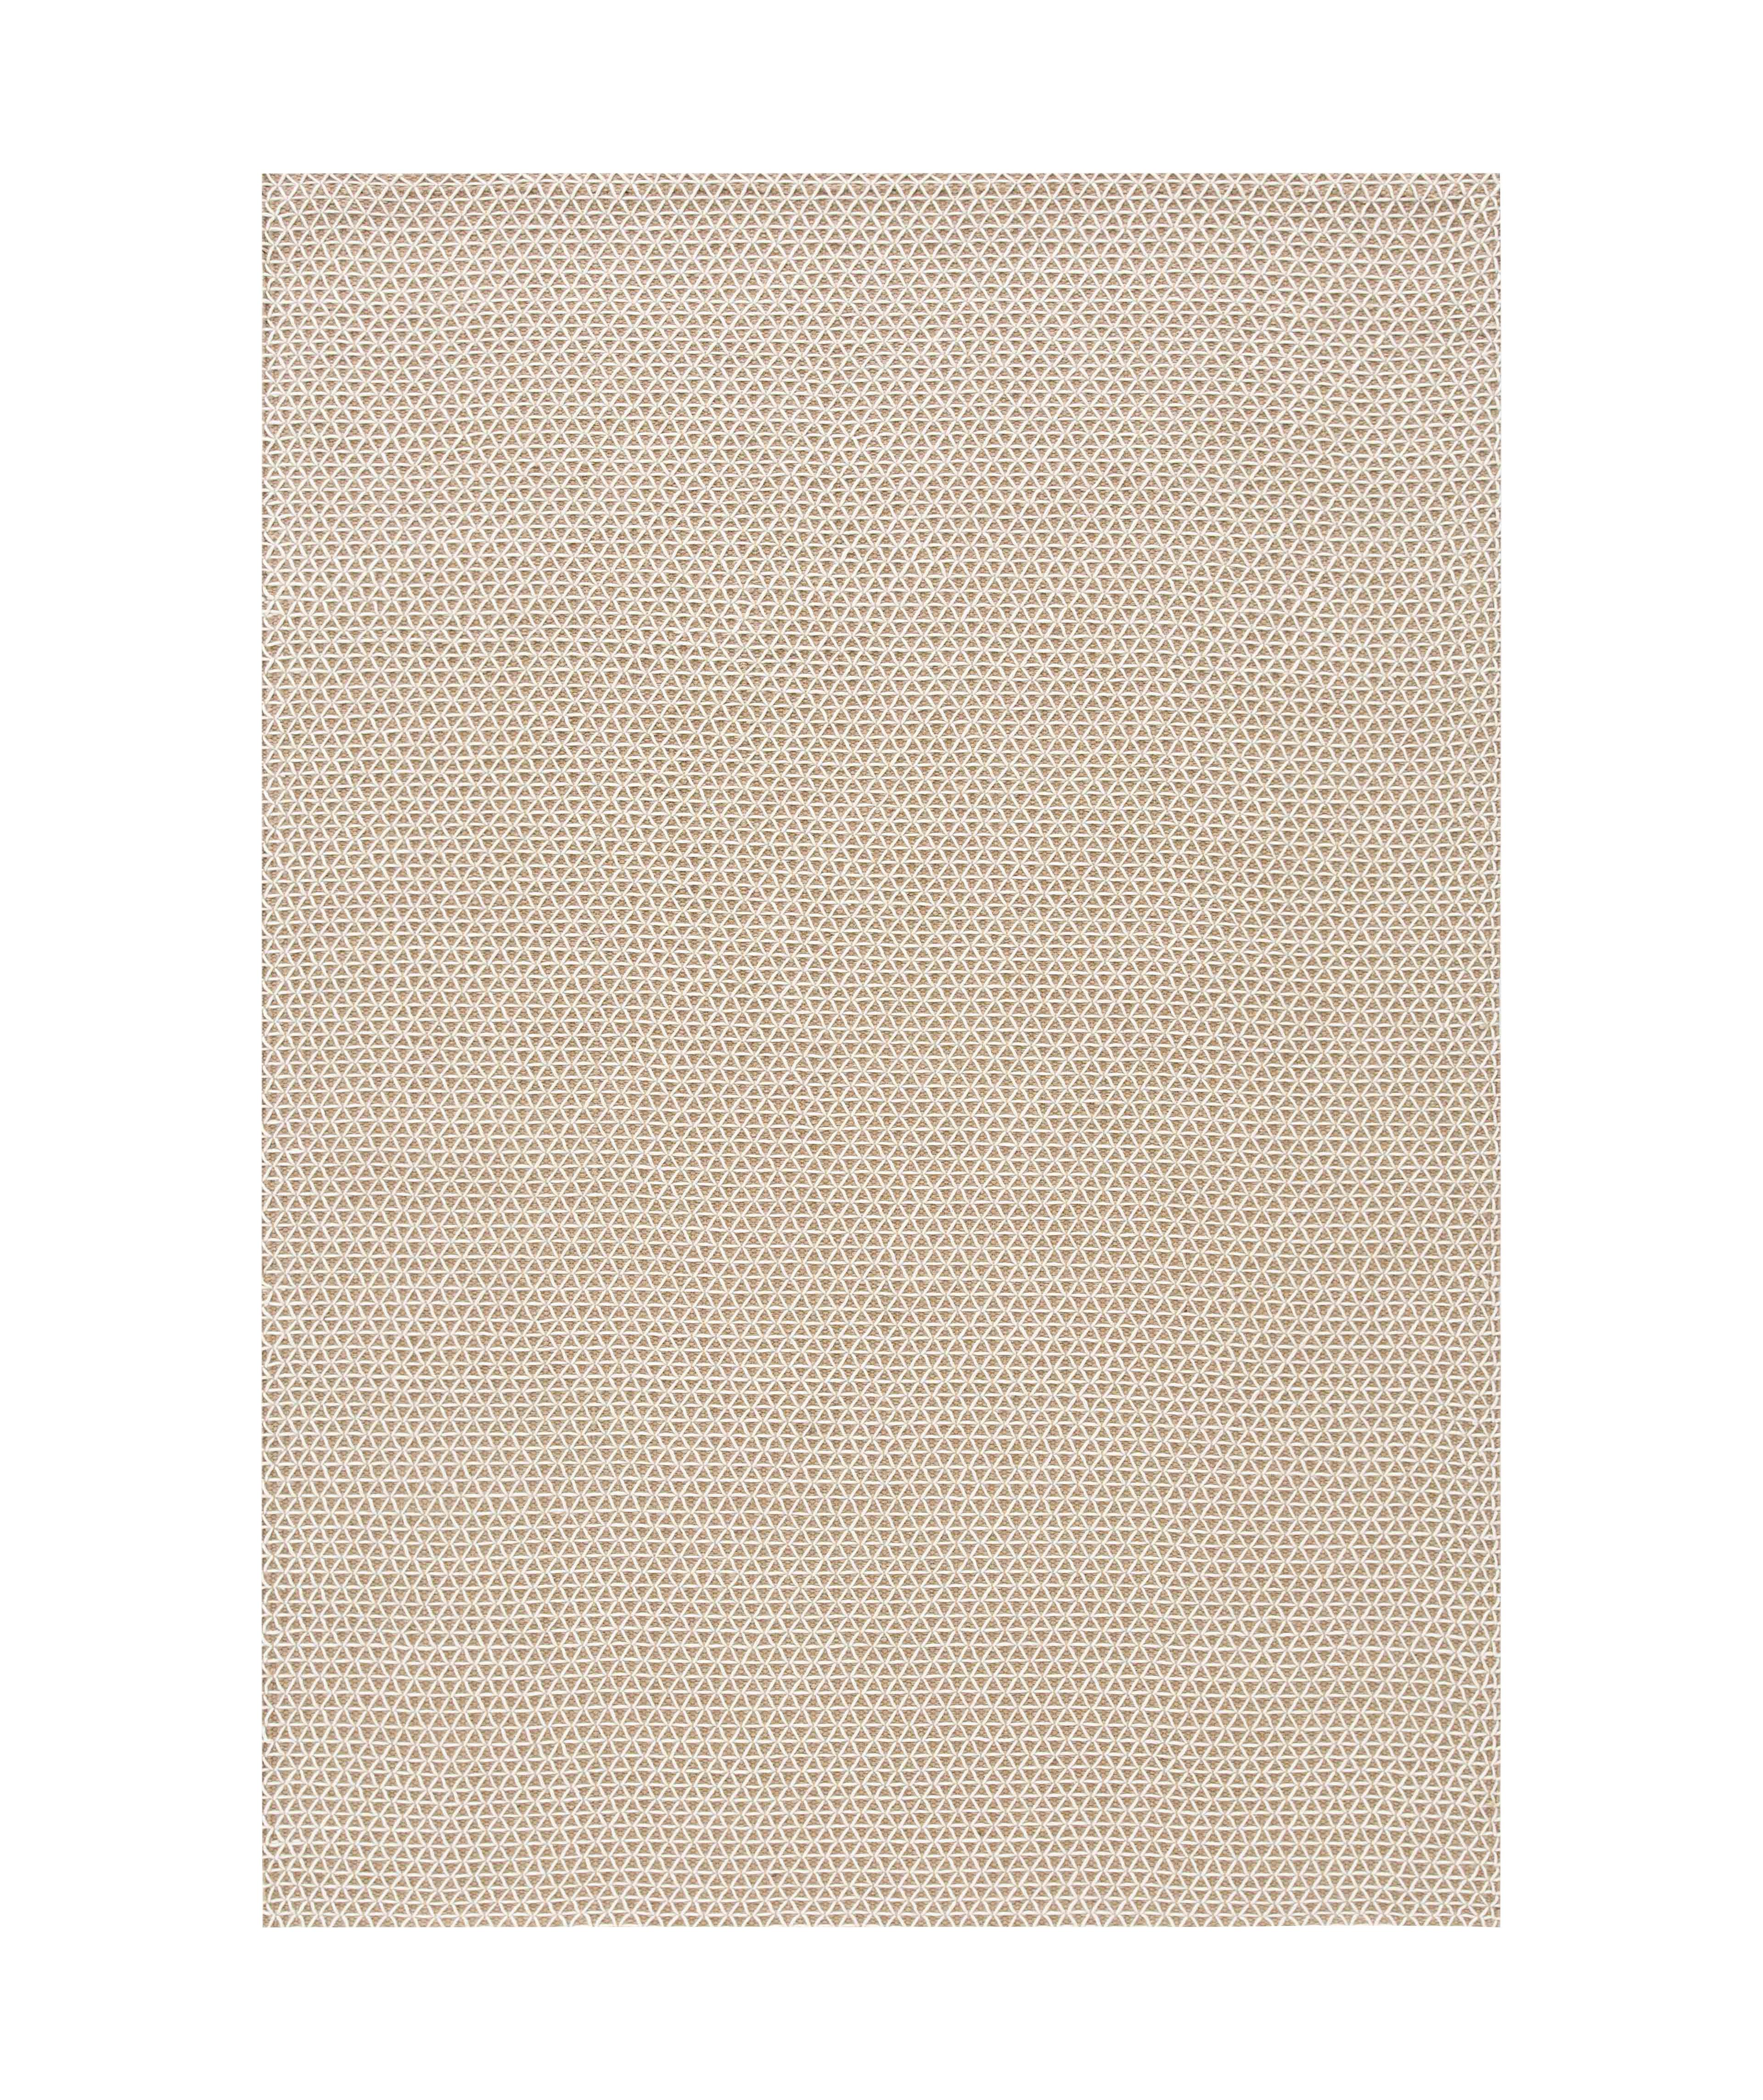 Interni - Tappeti - Tappeto Raw / 170 x 240 cm - Iuta & lana - Gan - Bianco/ Iuta naturale - Jute naturelle, Lana